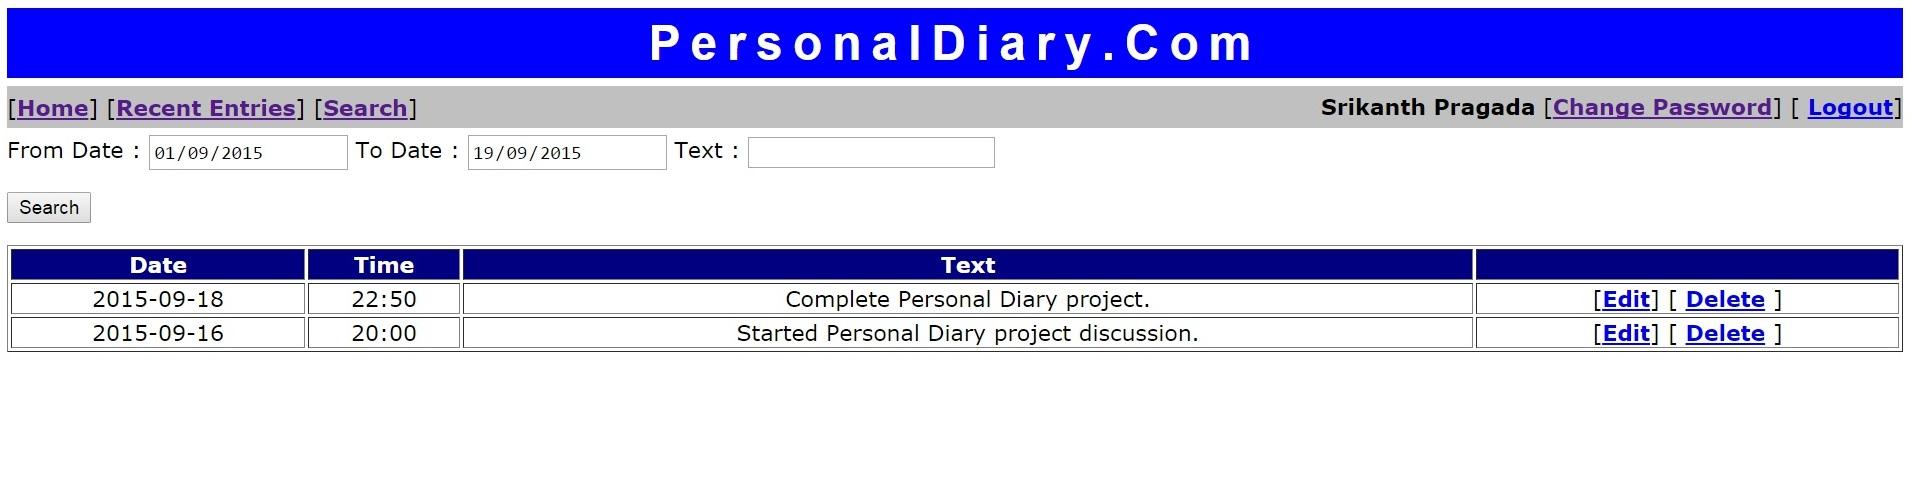 PersonalDiary Com Using JSF 2 2 + JDBC + Eclipse